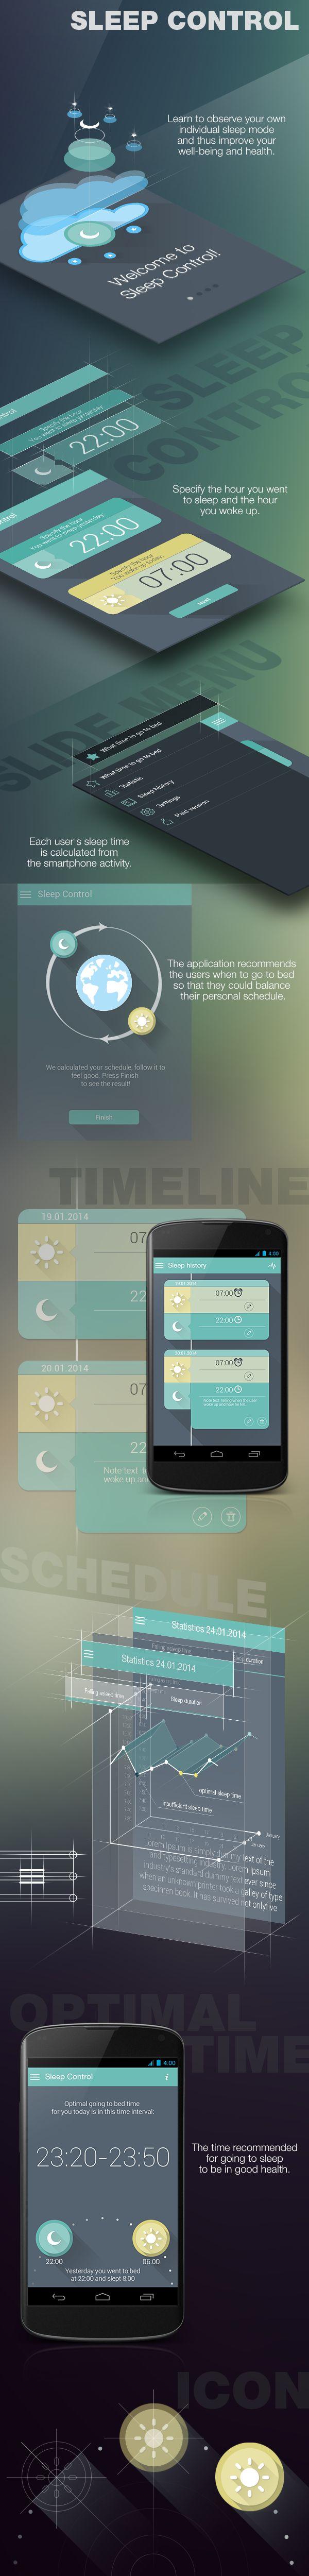 Sleep Control by Tubik Manufactory , via Behance